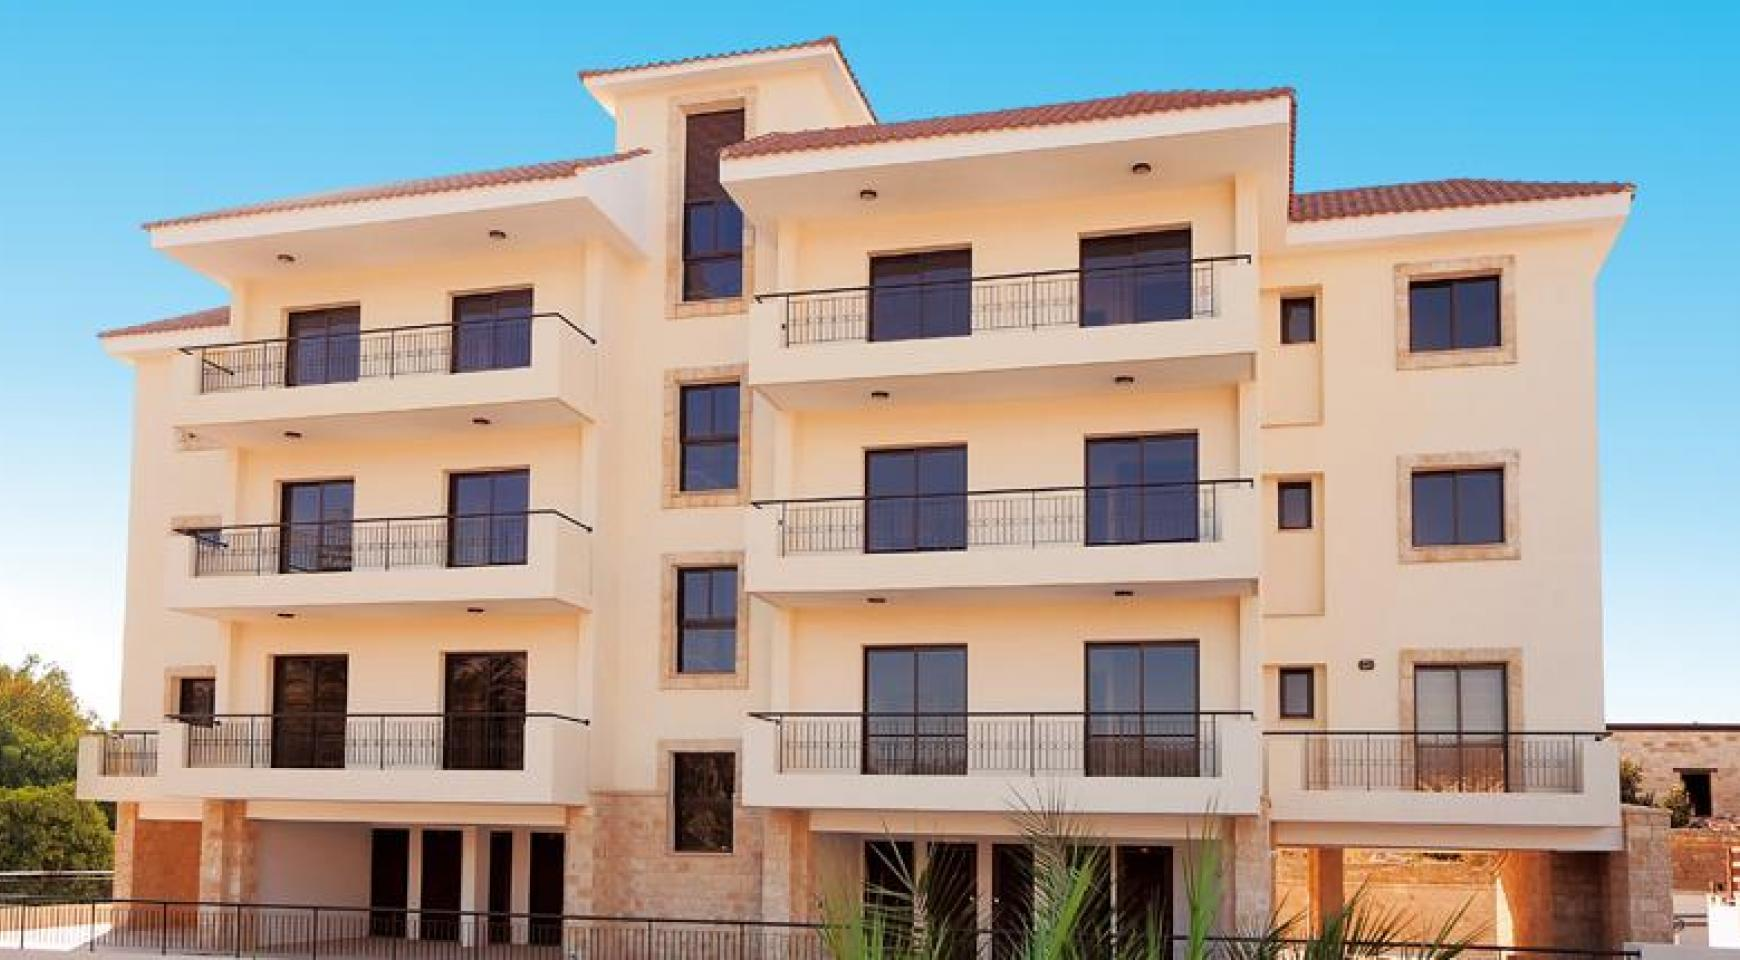 New One Bedroom Apartment in Germasogeia - 8